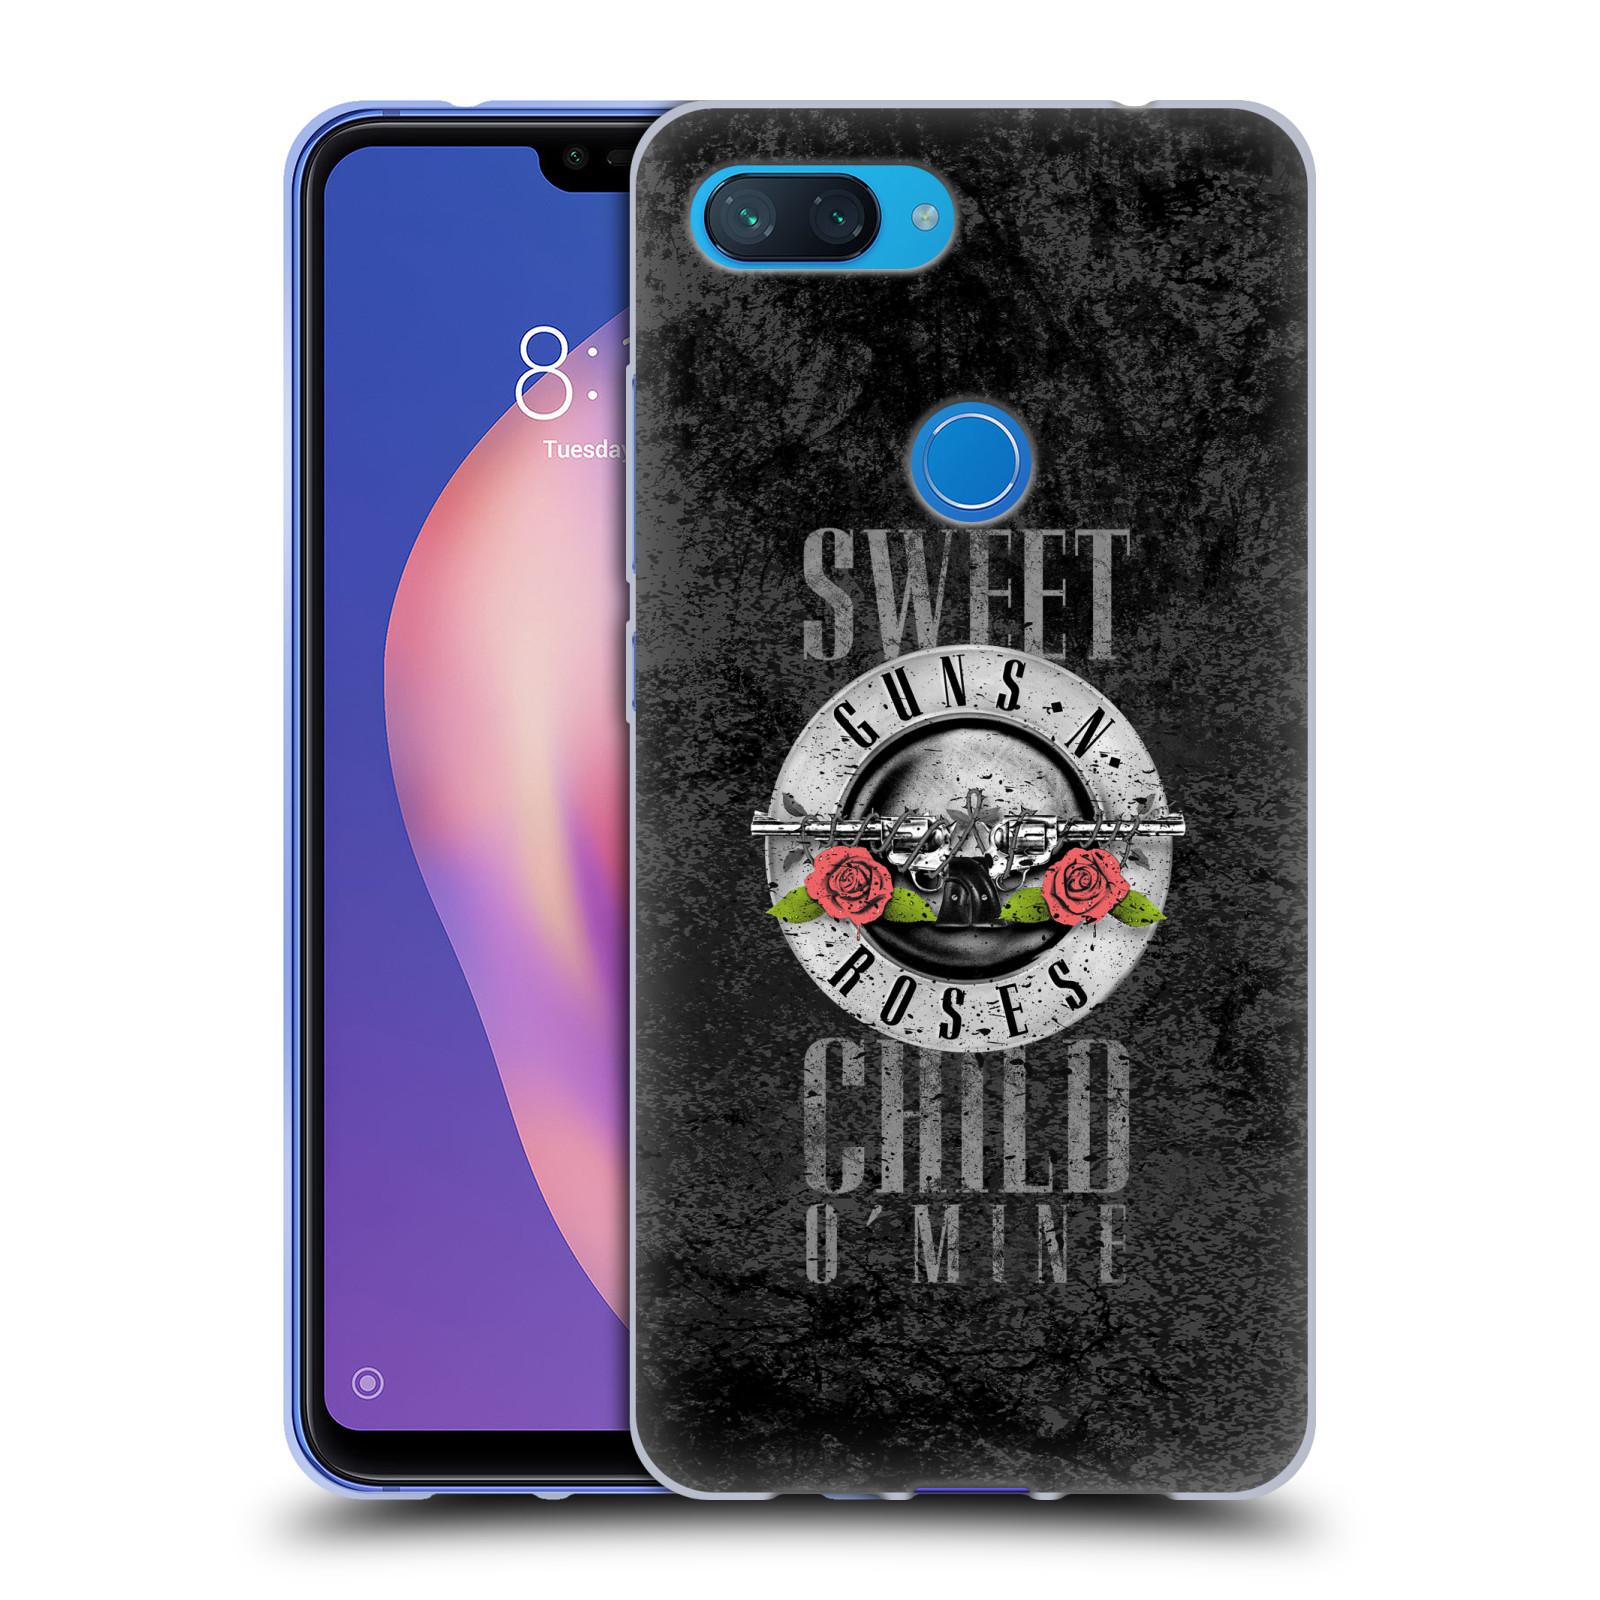 Silikonové pouzdro na mobil Xiaomi Mi 8 Lite - Head Case - Guns N' Roses - Sweet Child